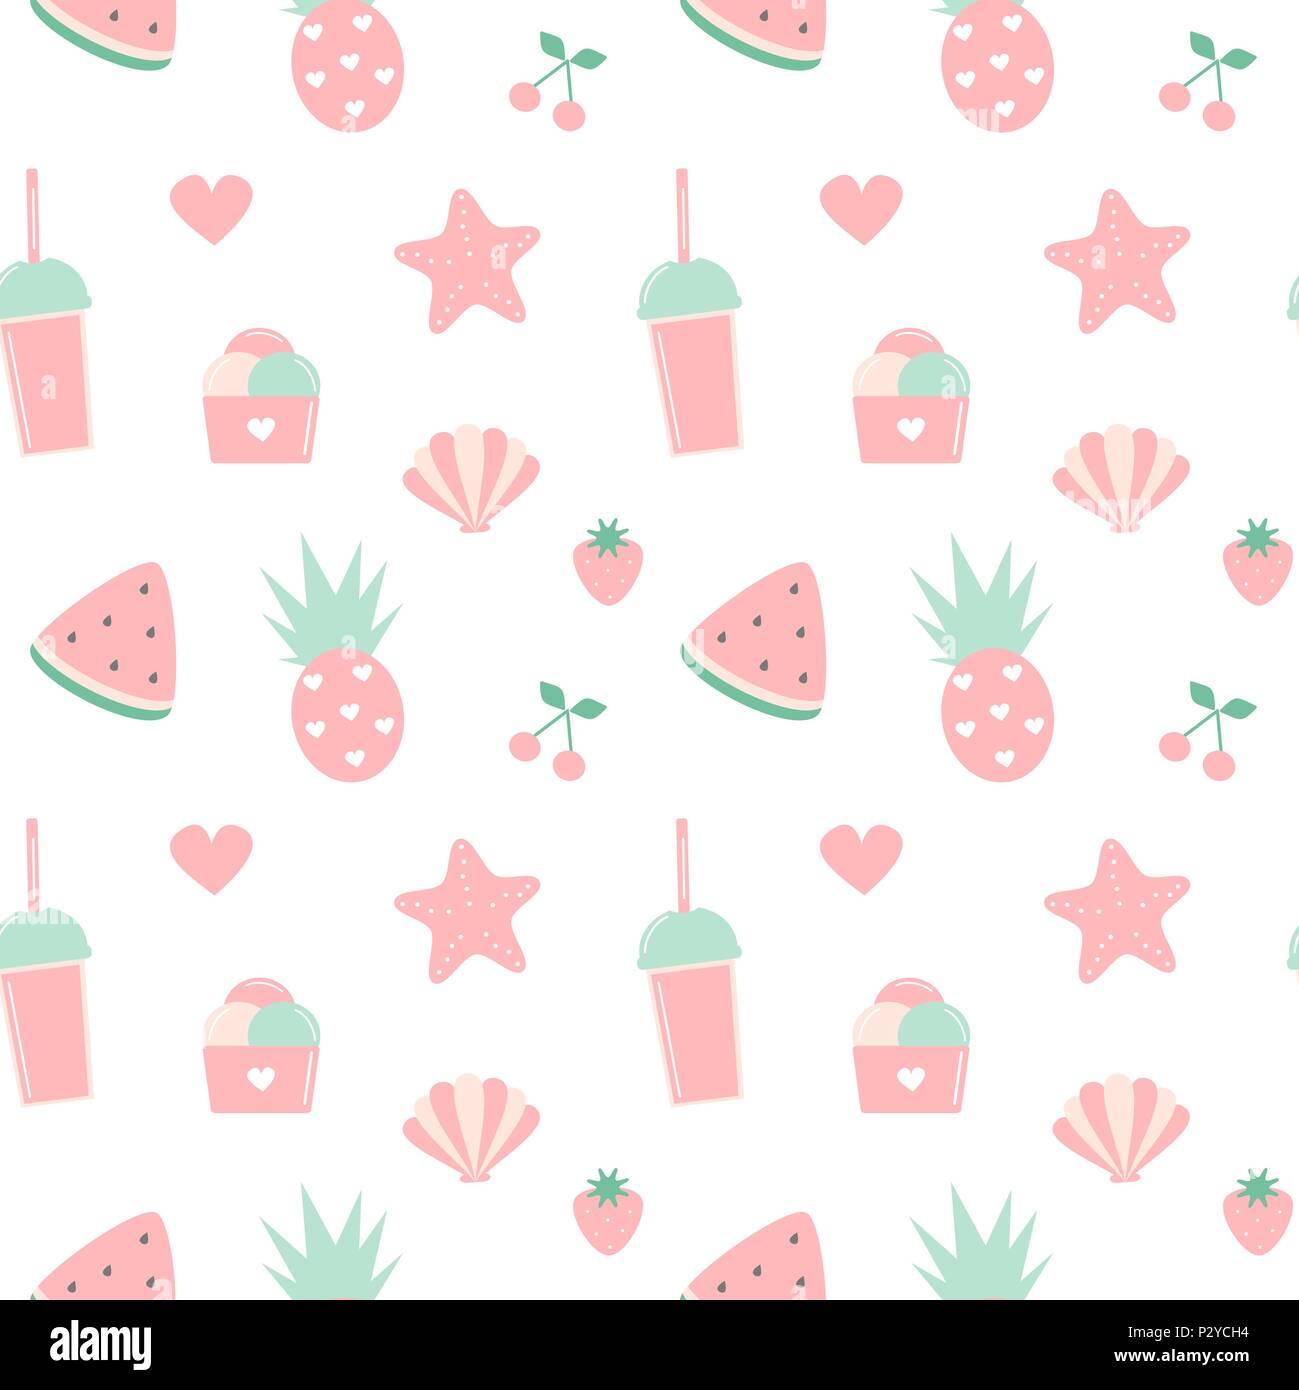 Fresh Ice Cream Stick In Summer Wallpaper Vector: Cute Summer Seamless Vector Pattern Background